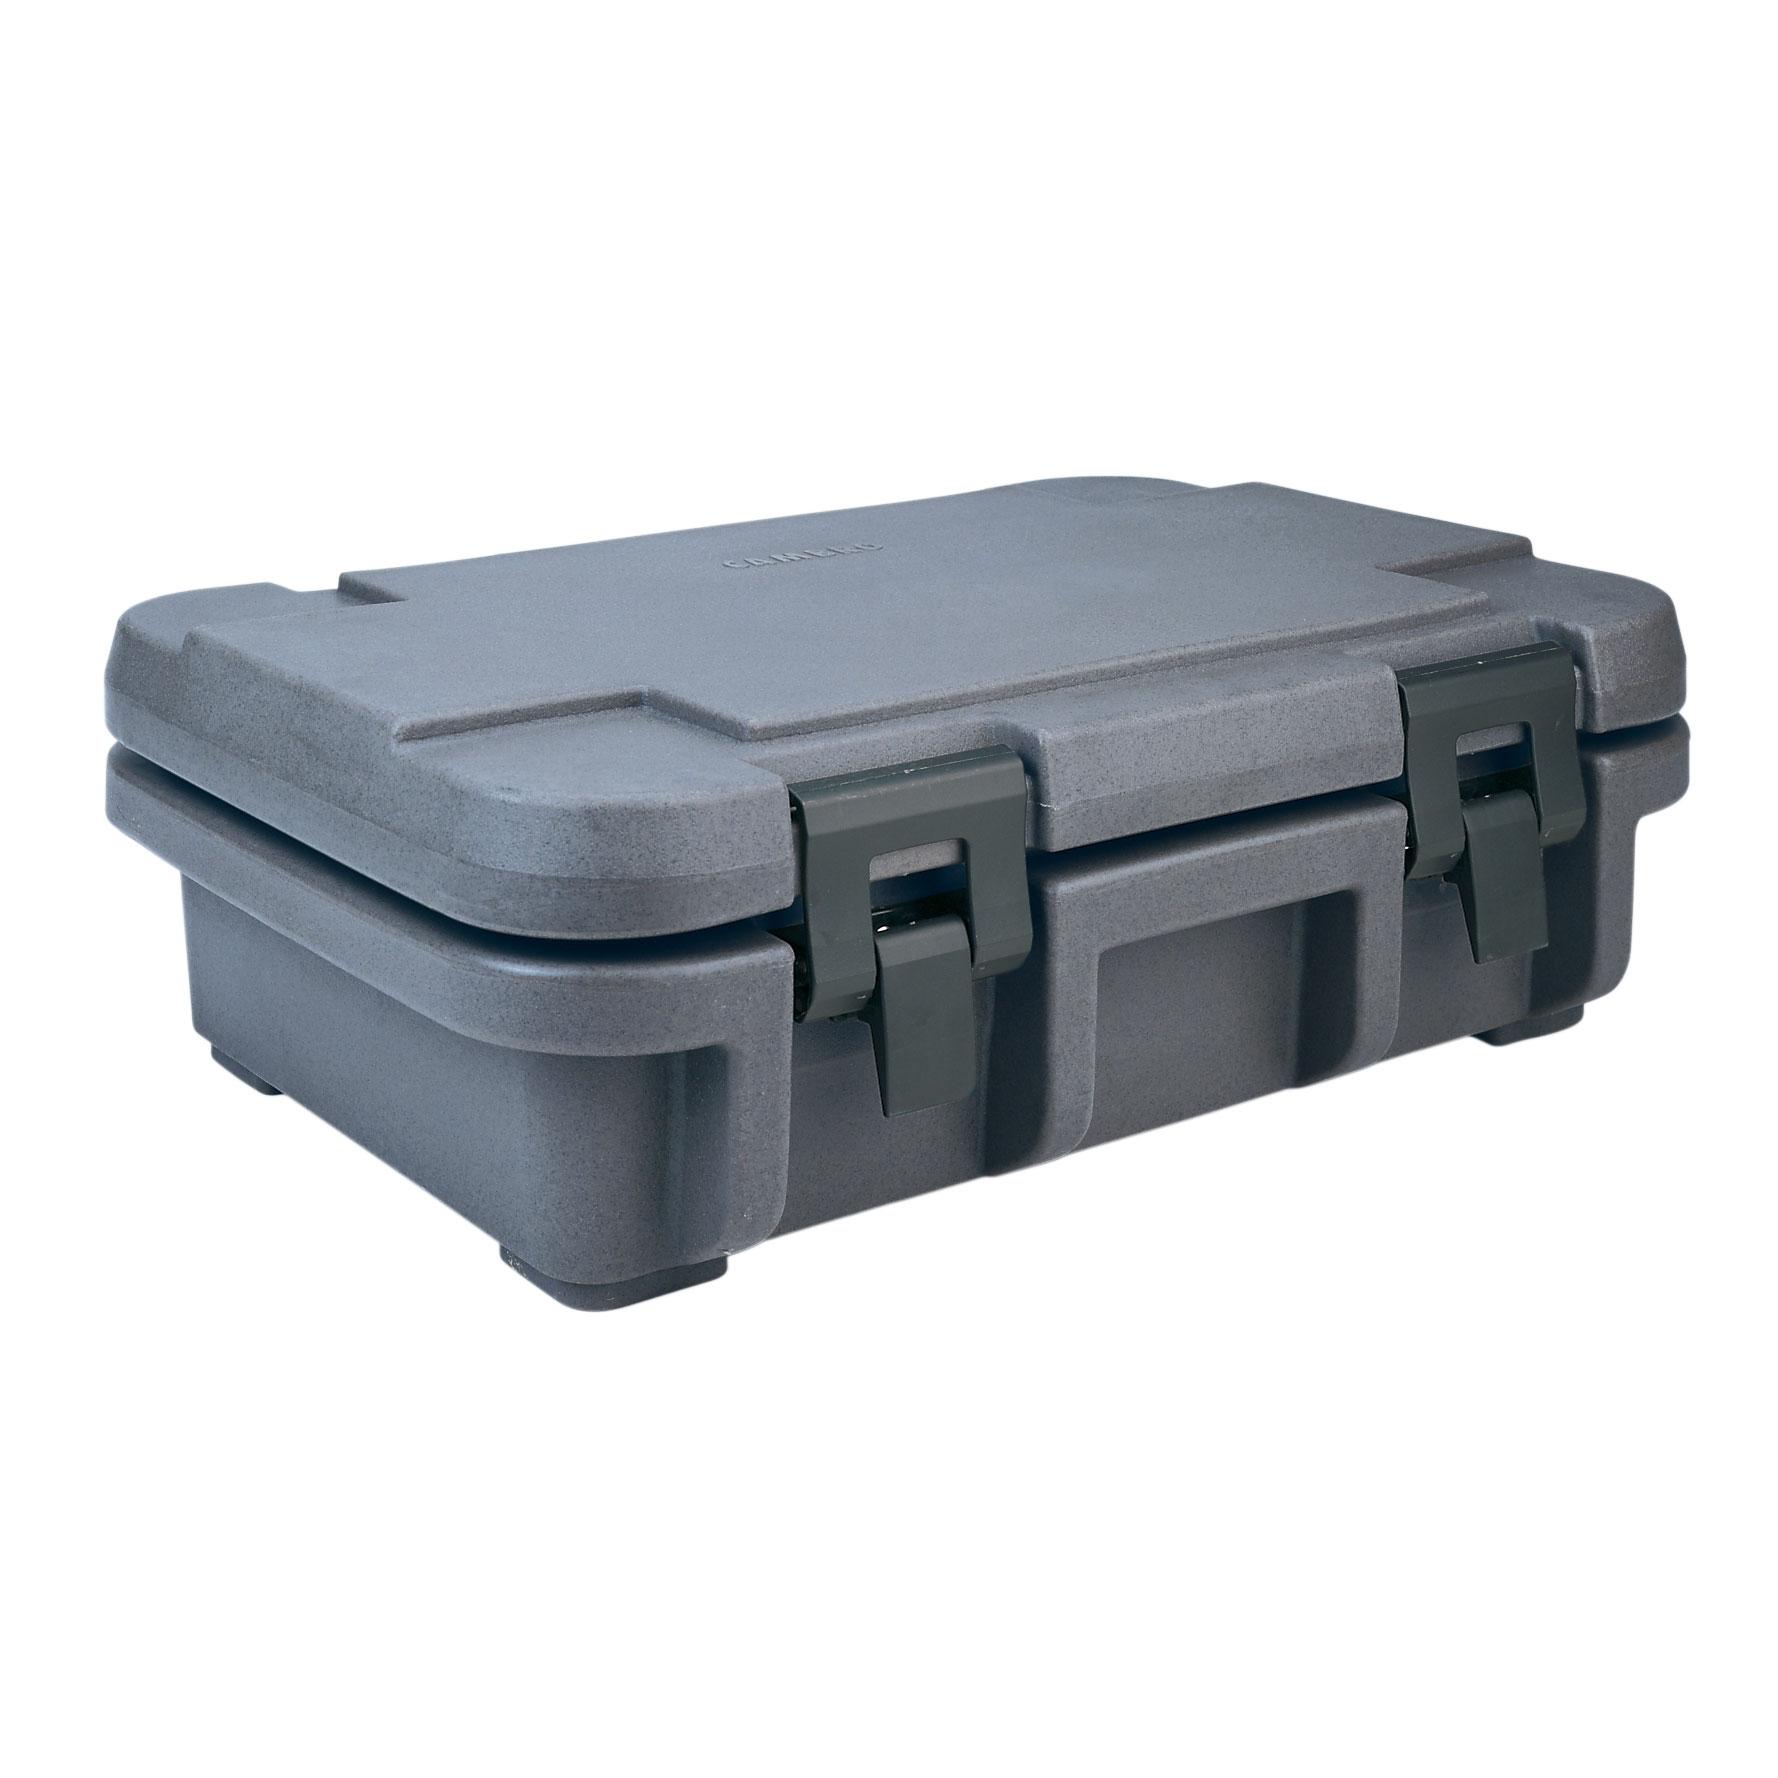 Cambro UPC140191 food pan carriers